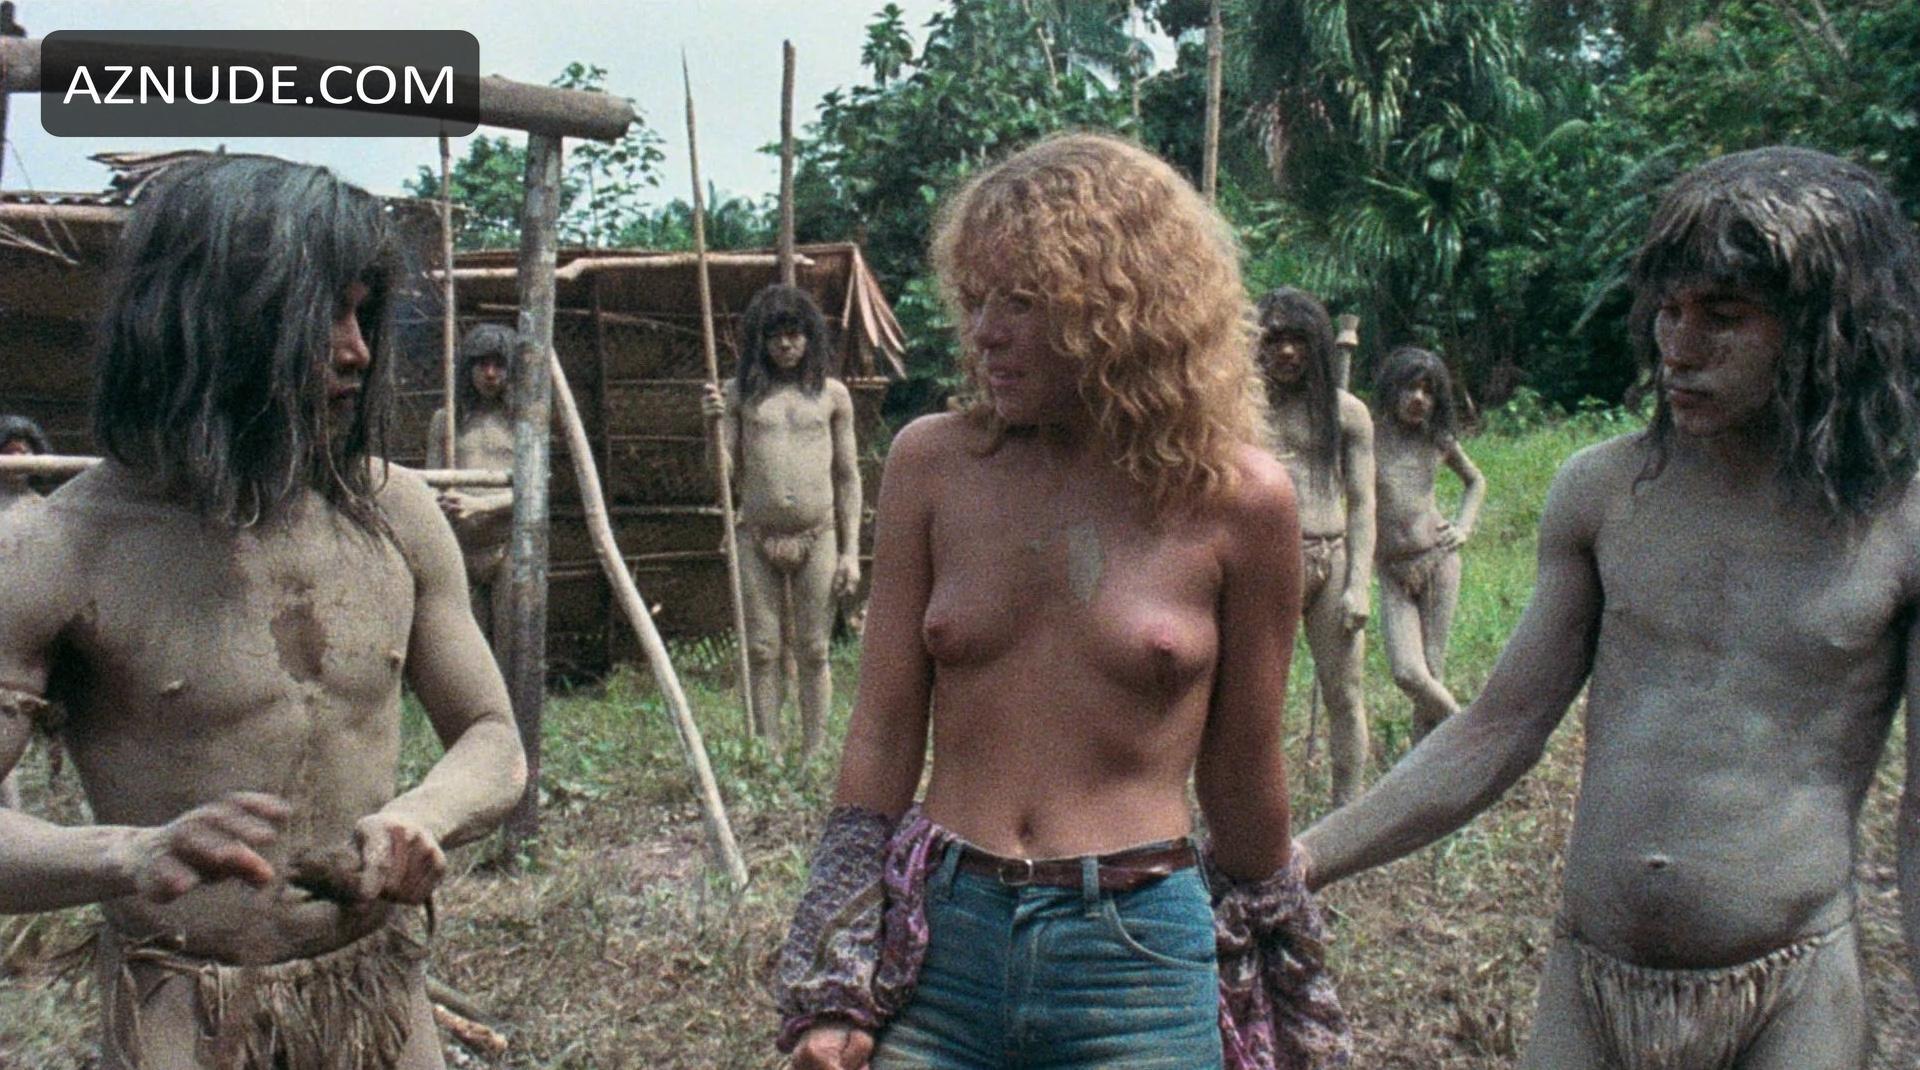 Finest Scarlett Johansson Fake Nude Photos Pics